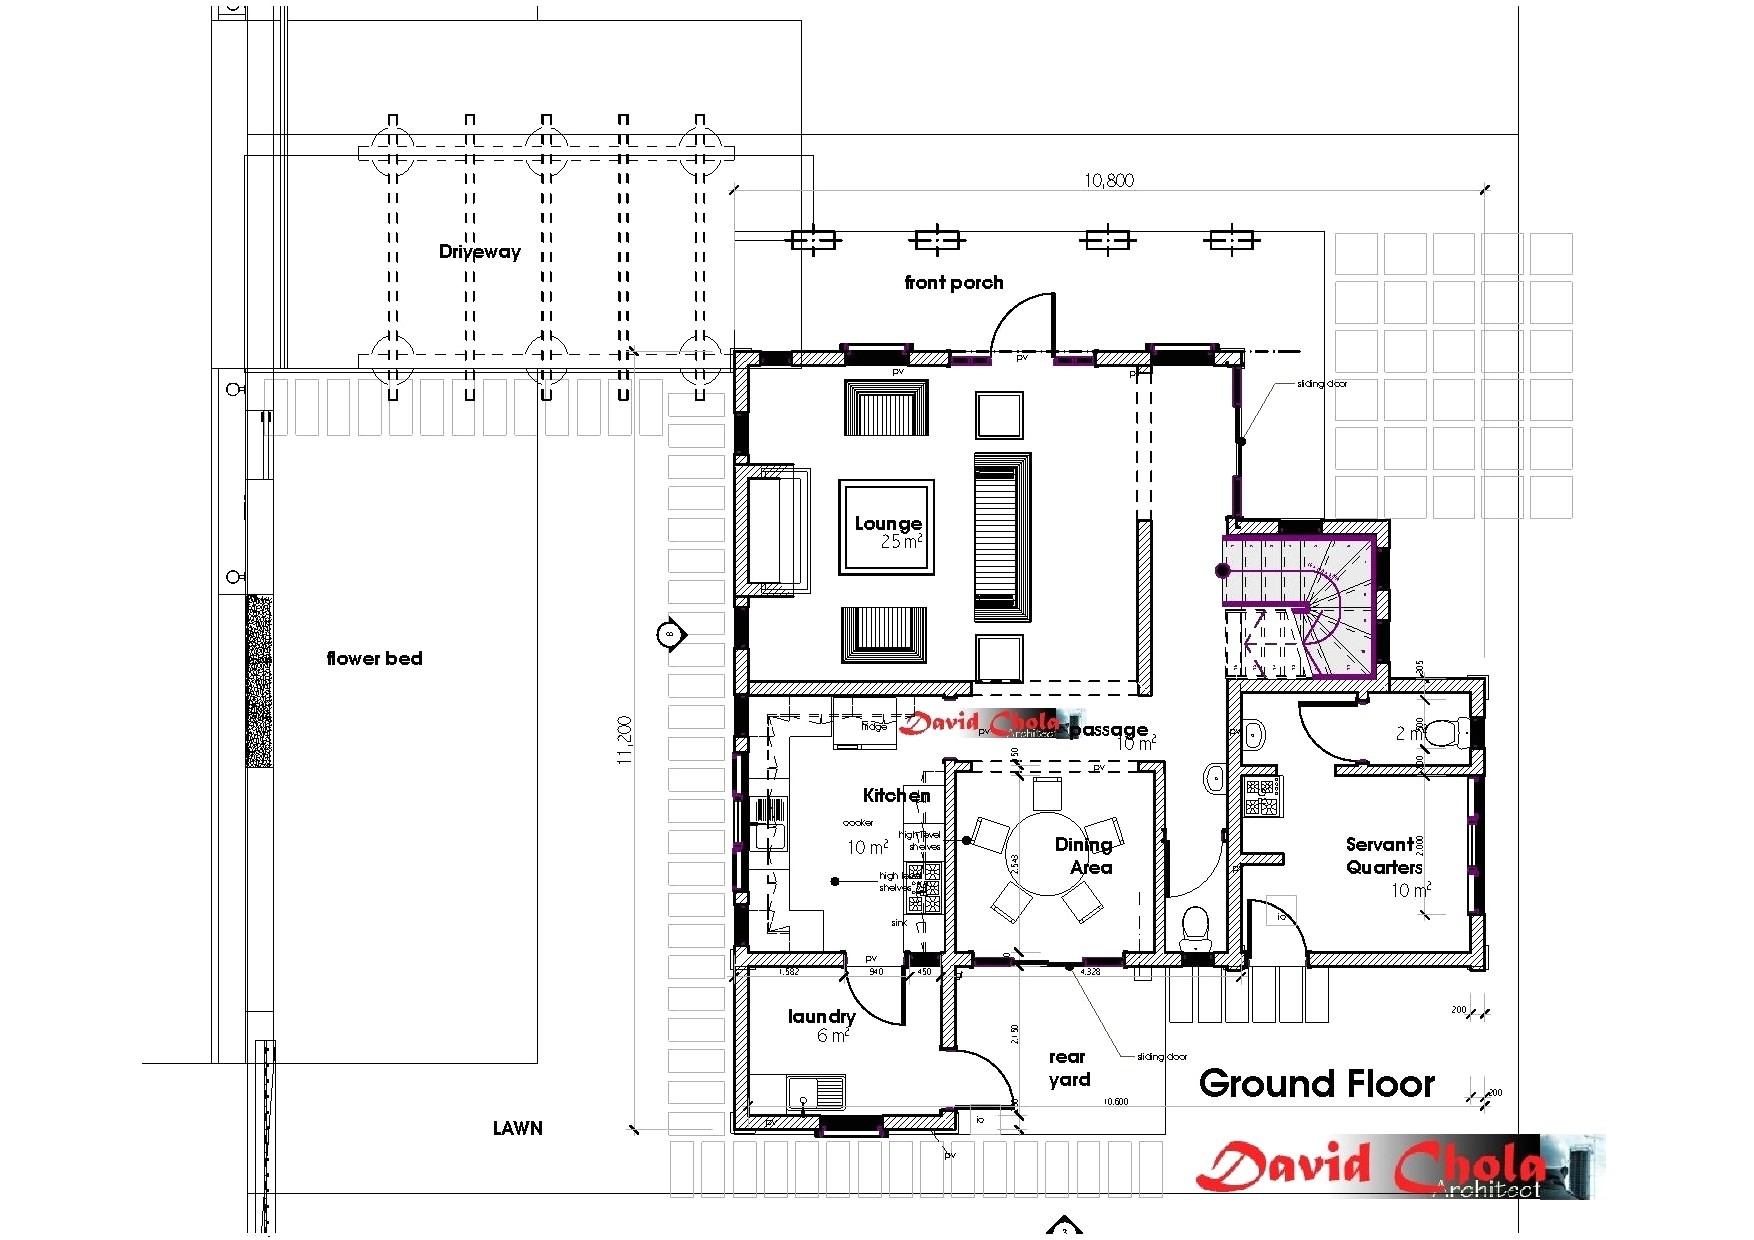 bhg small house plans beautiful better homes and gardens plan a garden chris benz